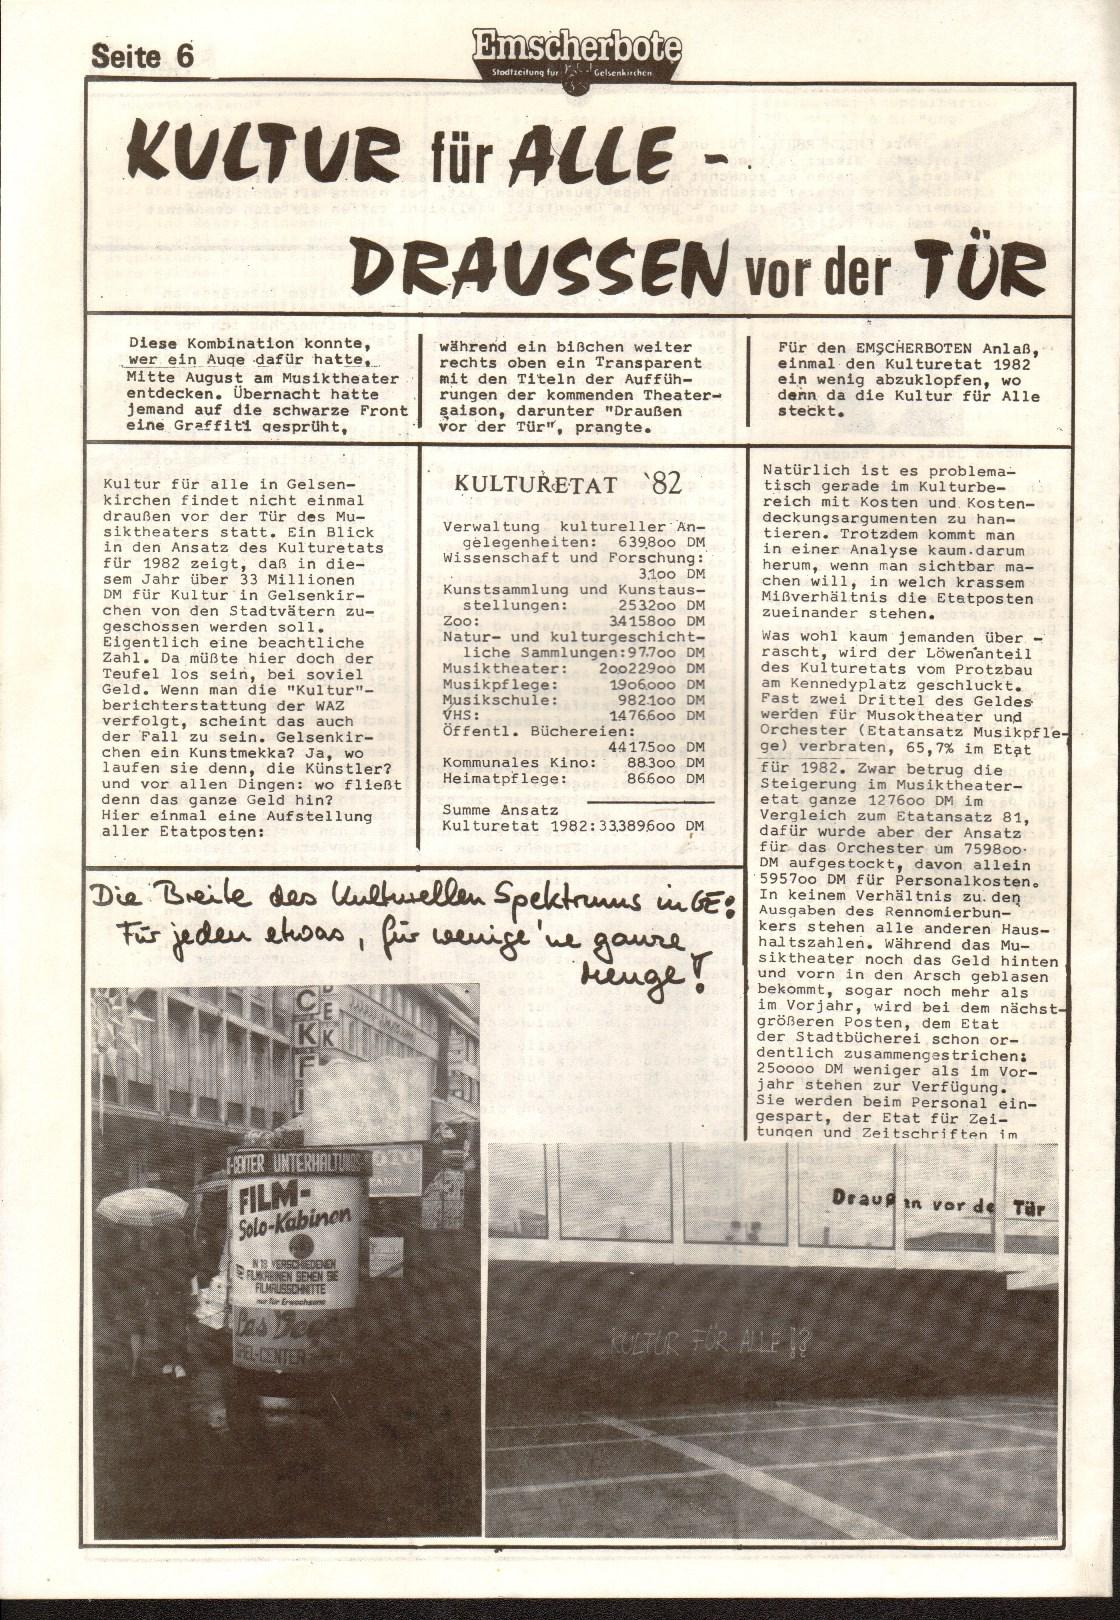 Gelsenkirchen_Emscherbote_1982_21_06